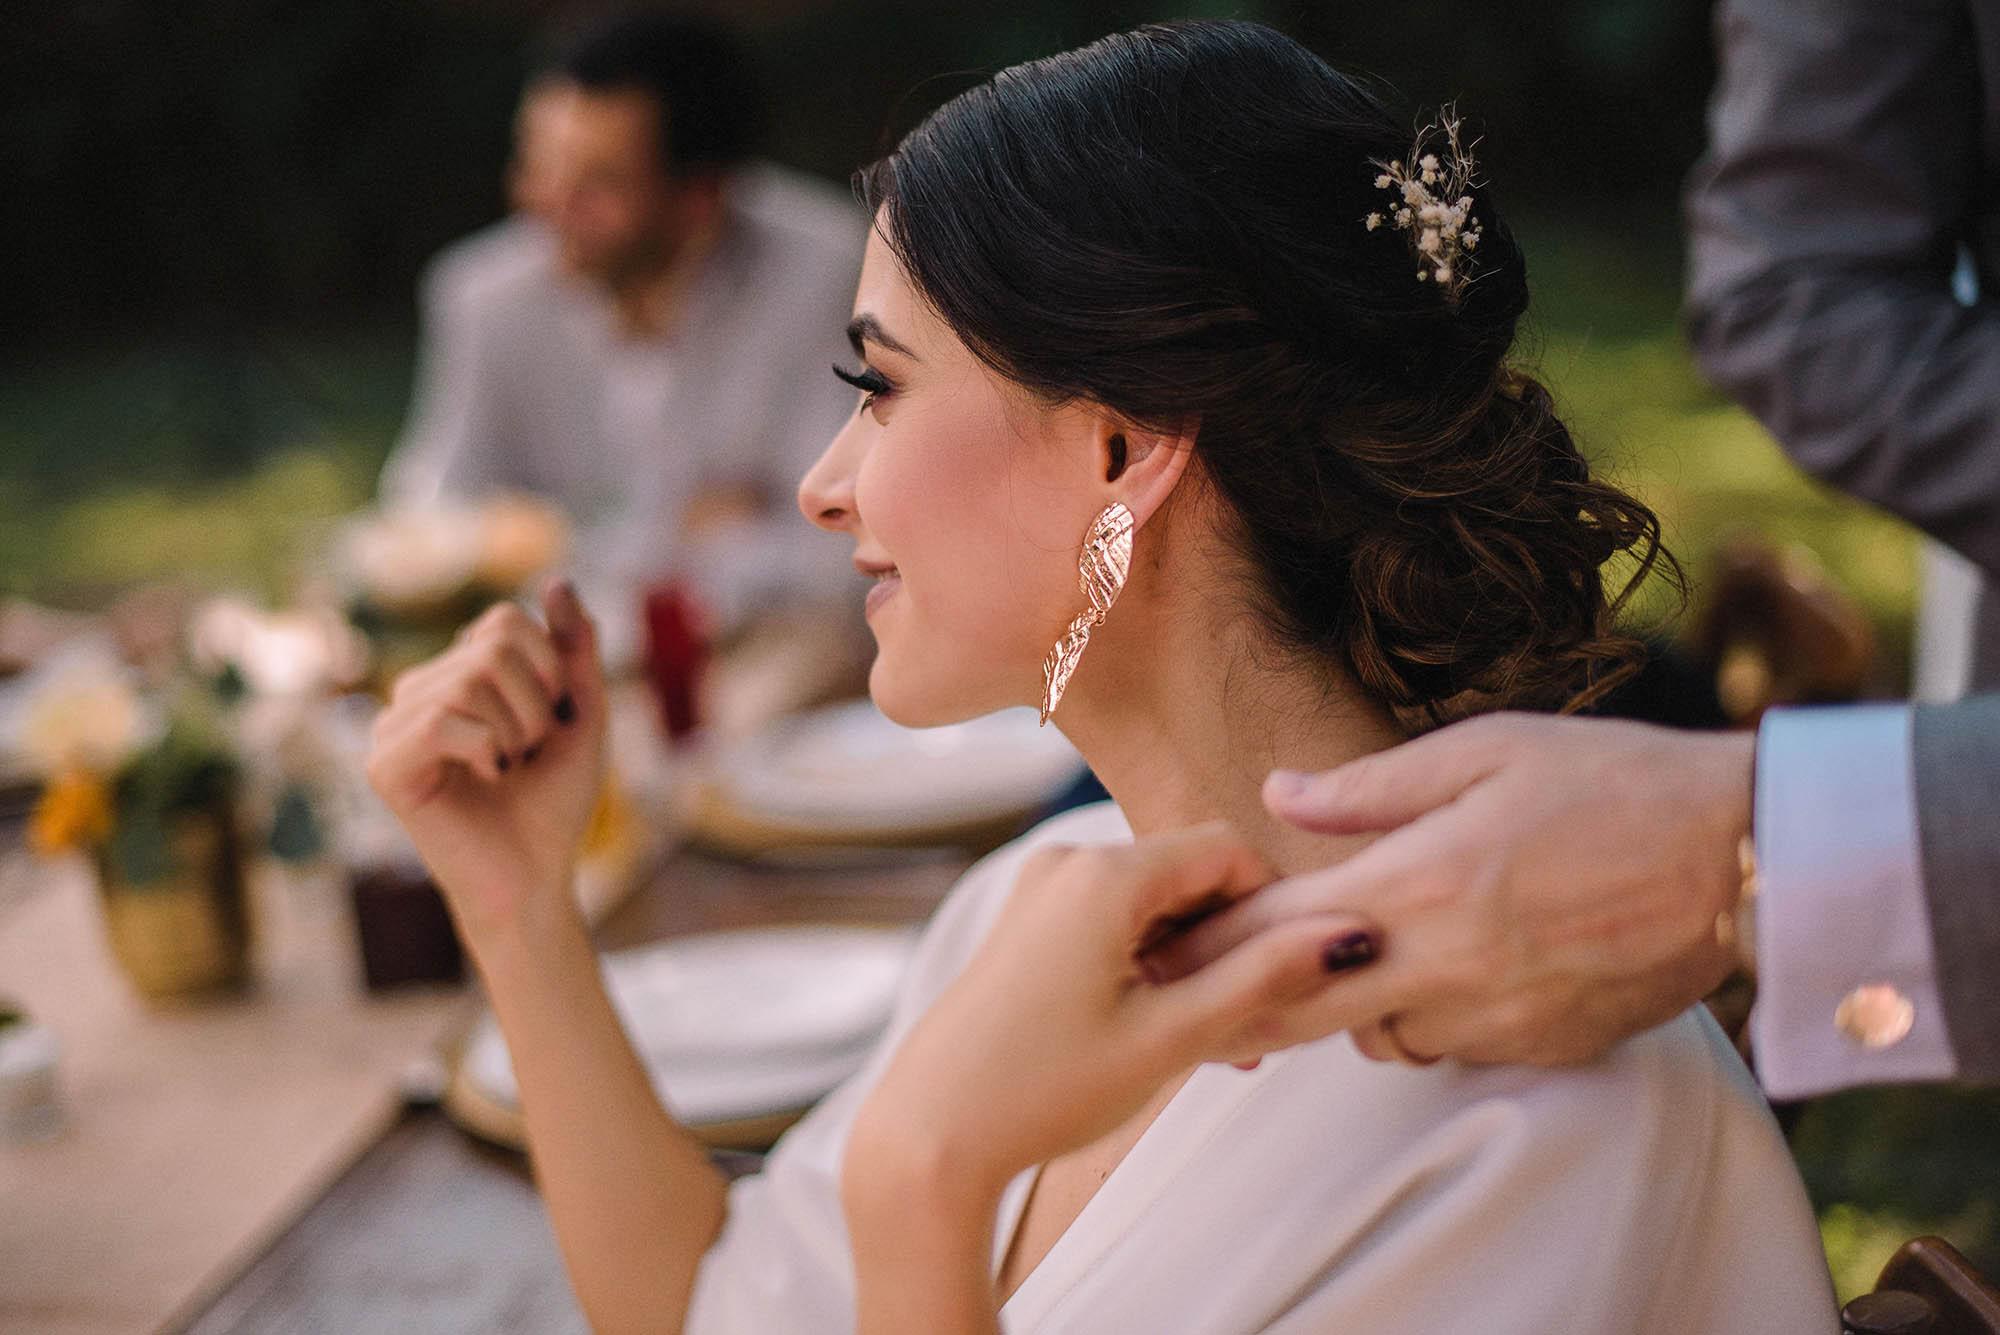 magali espinosa fotografo guadalajara boda huaxtla hacienda 20.jpg